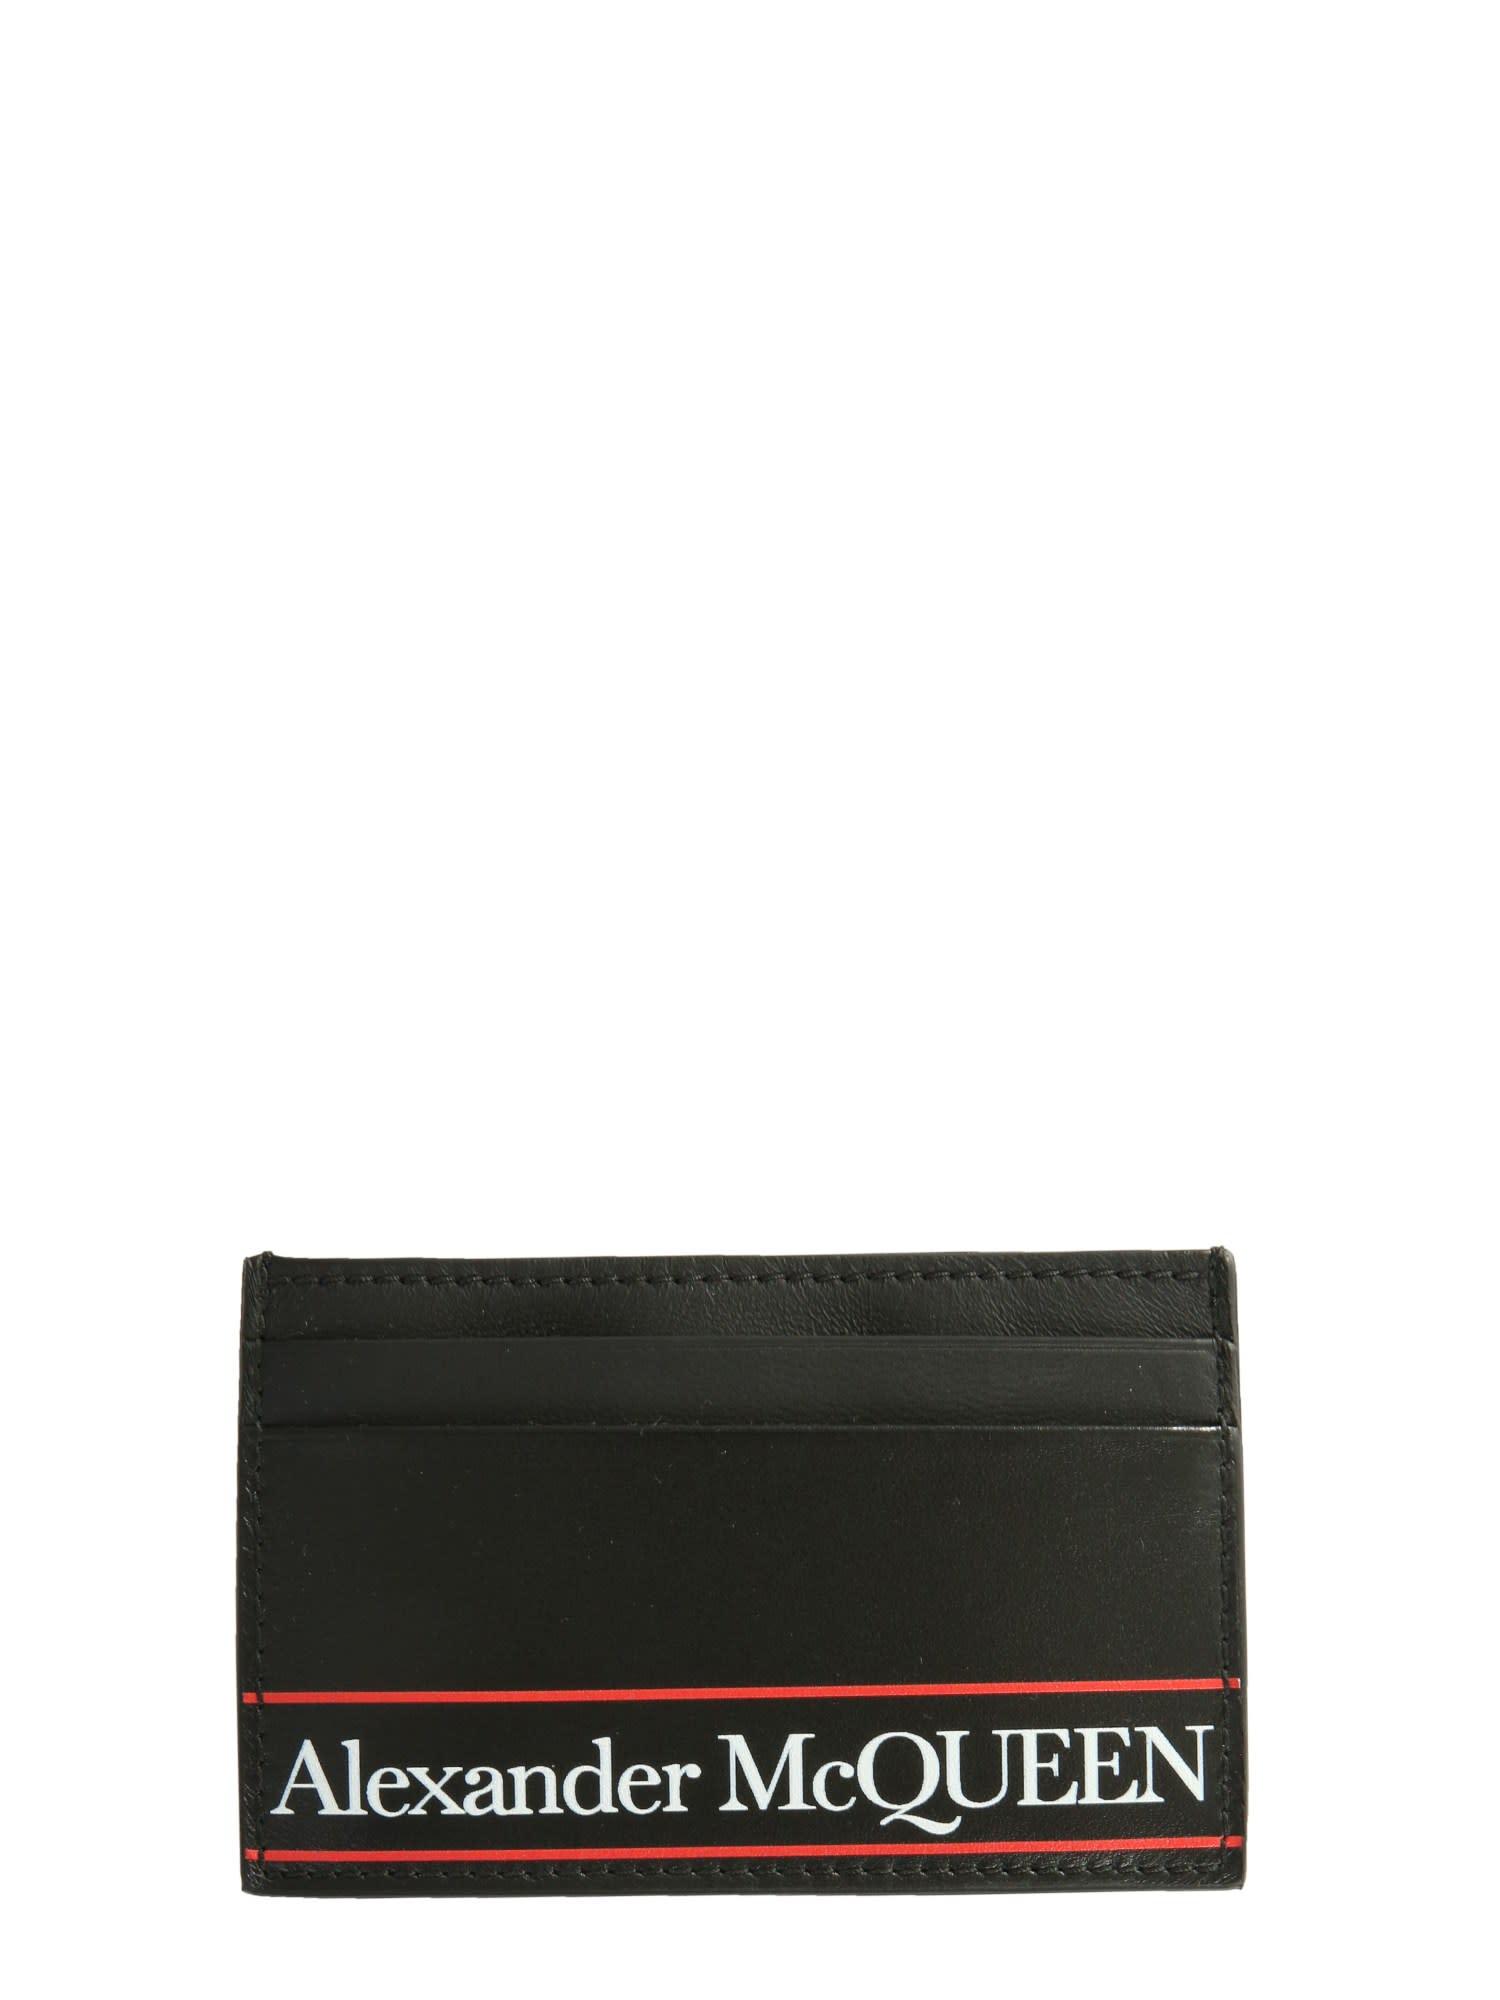 Alexander Mcqueen Card Holder With Logo In Nero